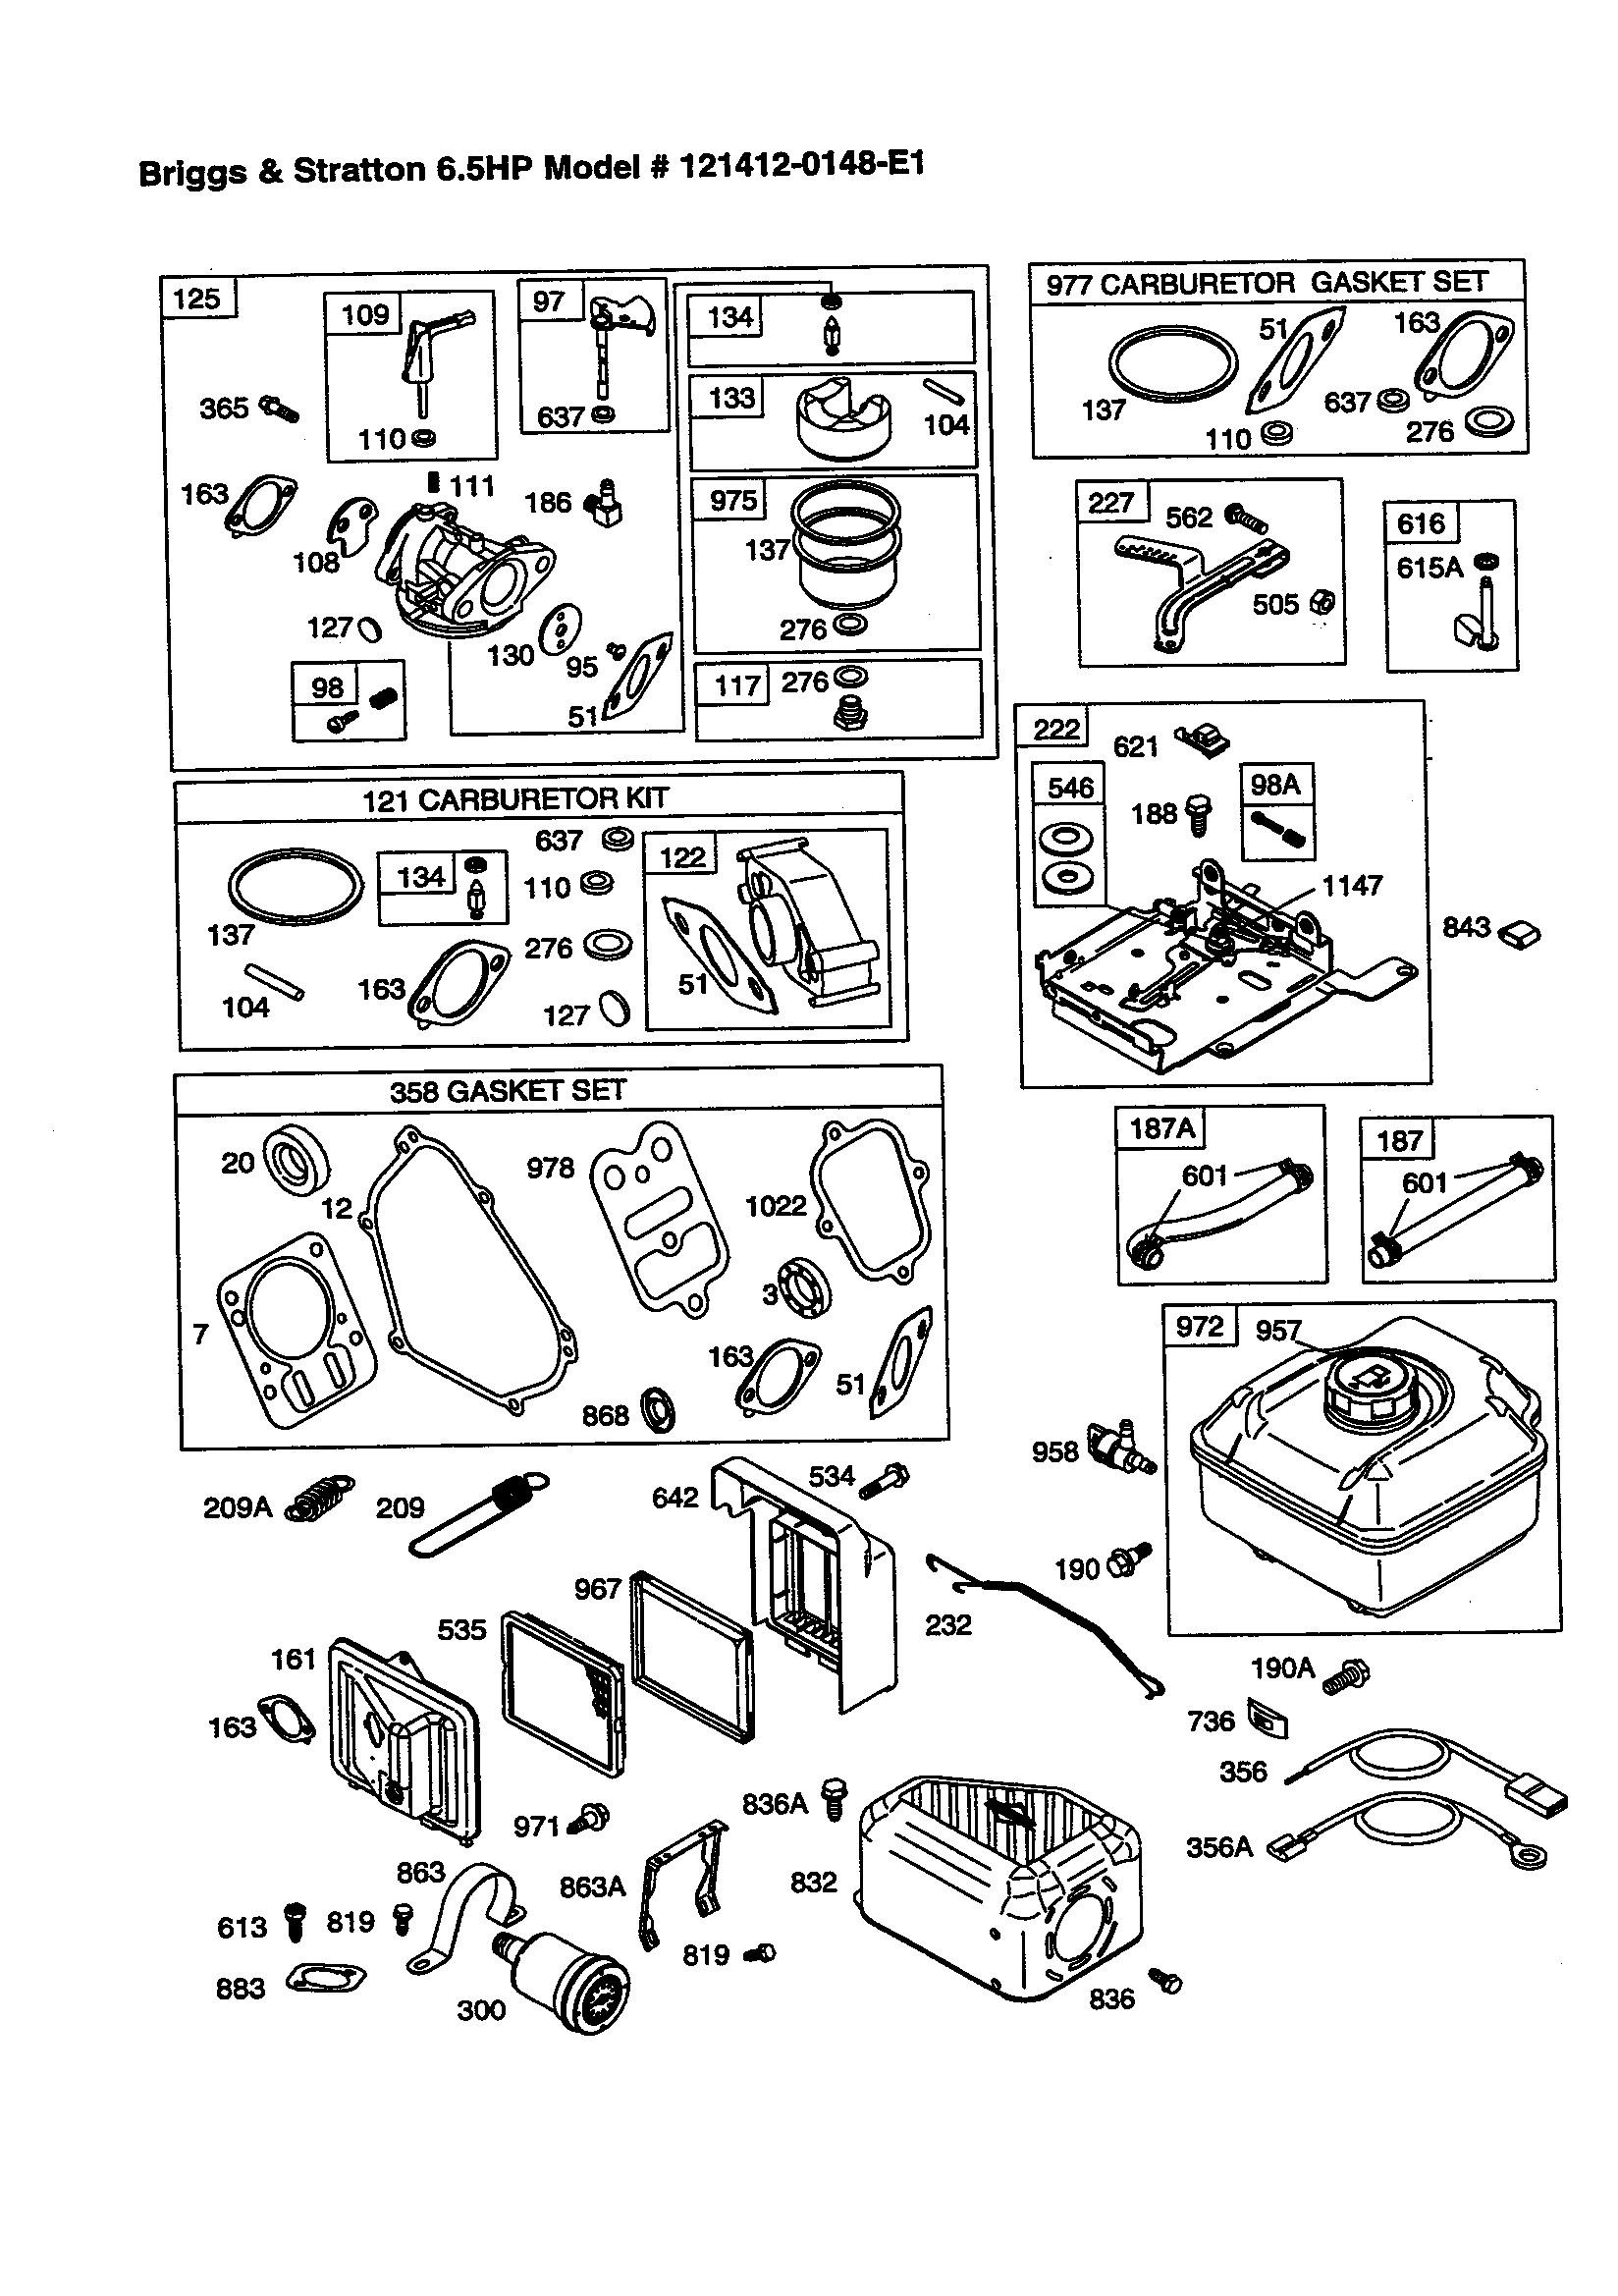 hight resolution of 173cc ohv engine parts diagram wiring schematic diagram18 hp intek best library kohler